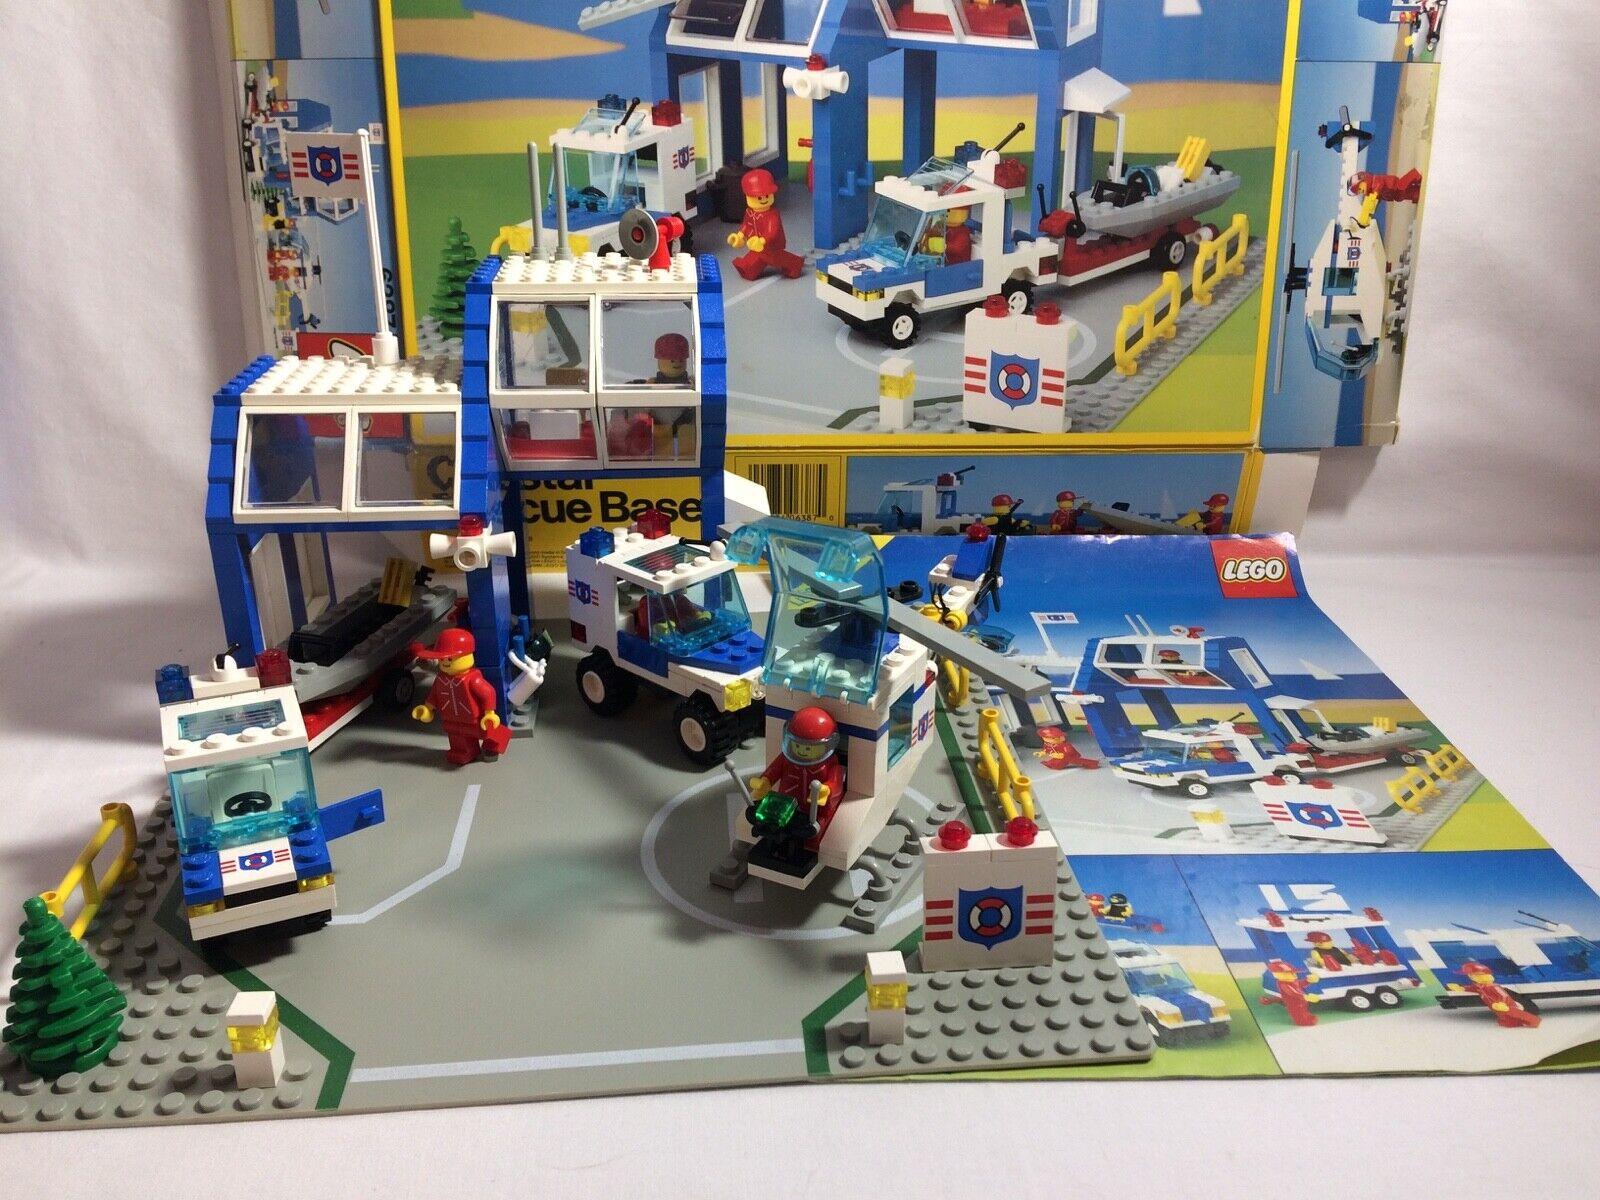 Vintage Lego Coastal Rescue Base  6387 Complete Instructions Box